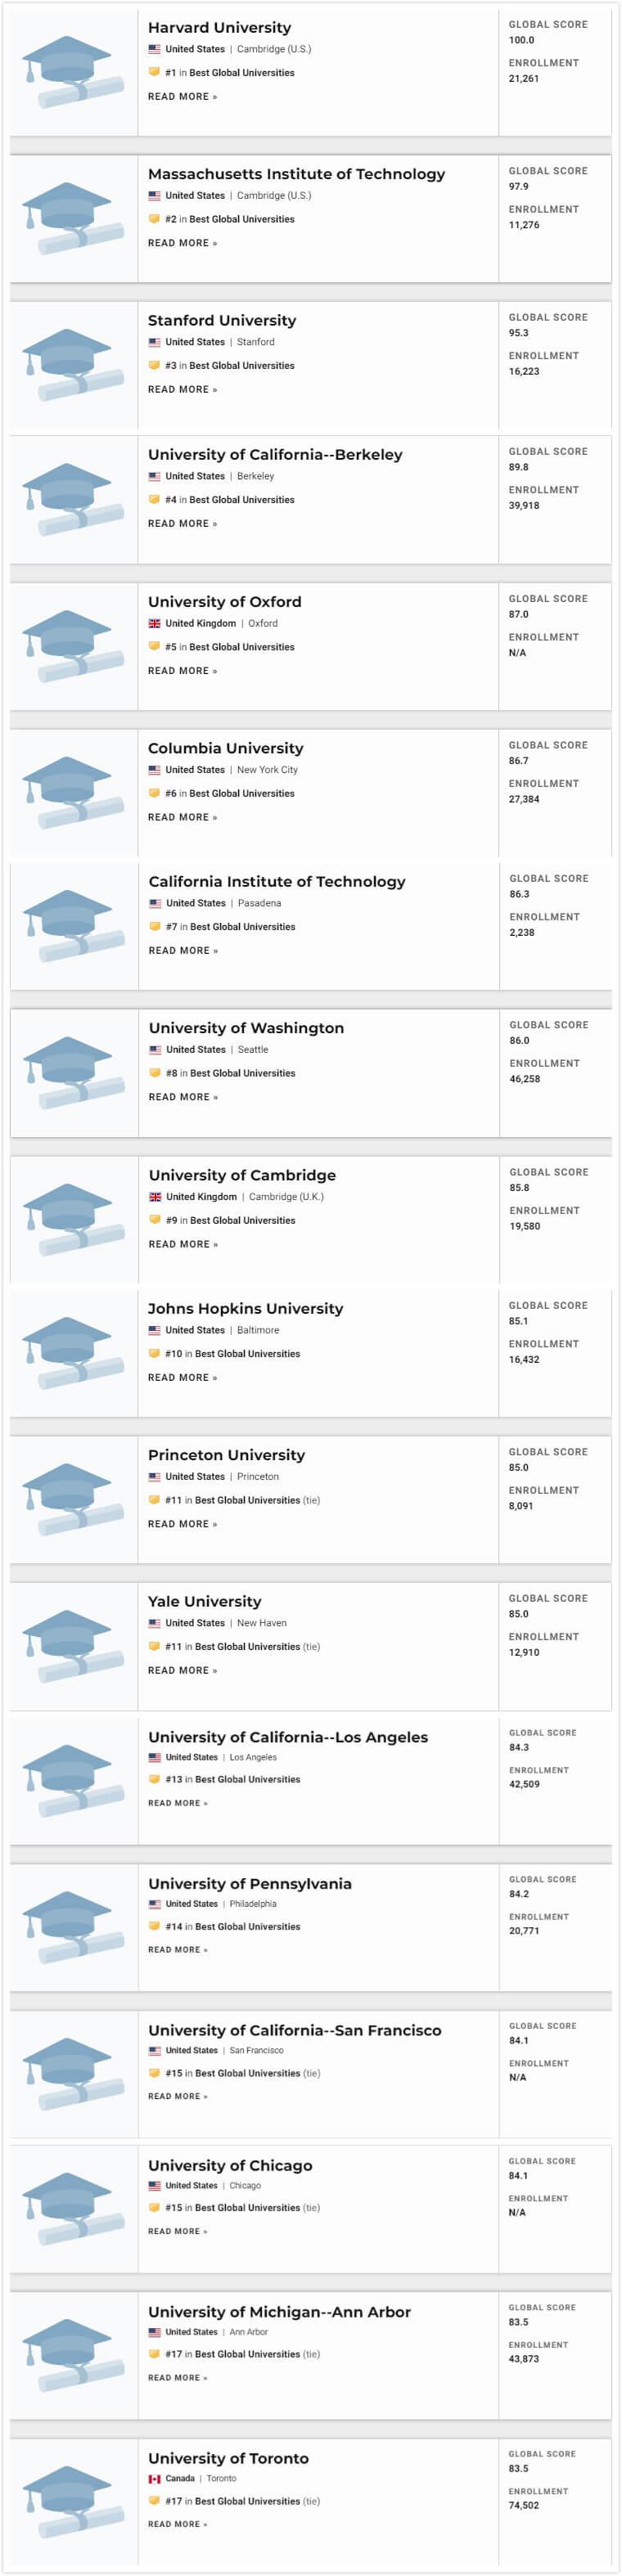 2021U.S.News世界大学排名1